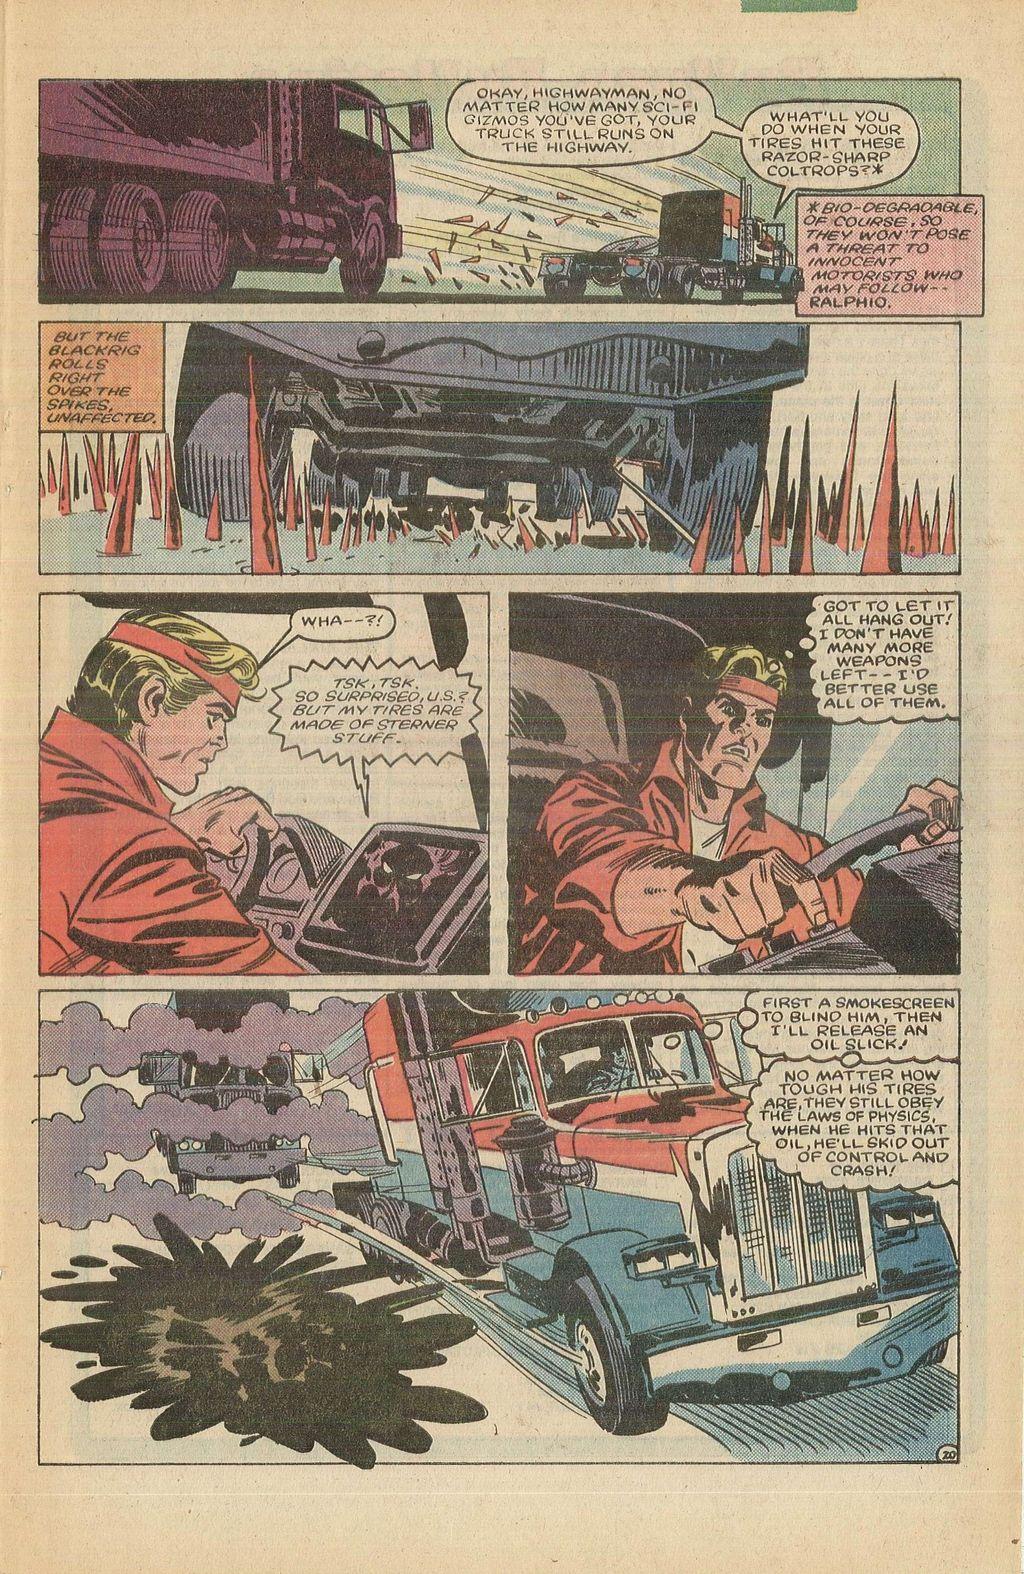 Read online U.S. 1 comic -  Issue #10 - 29